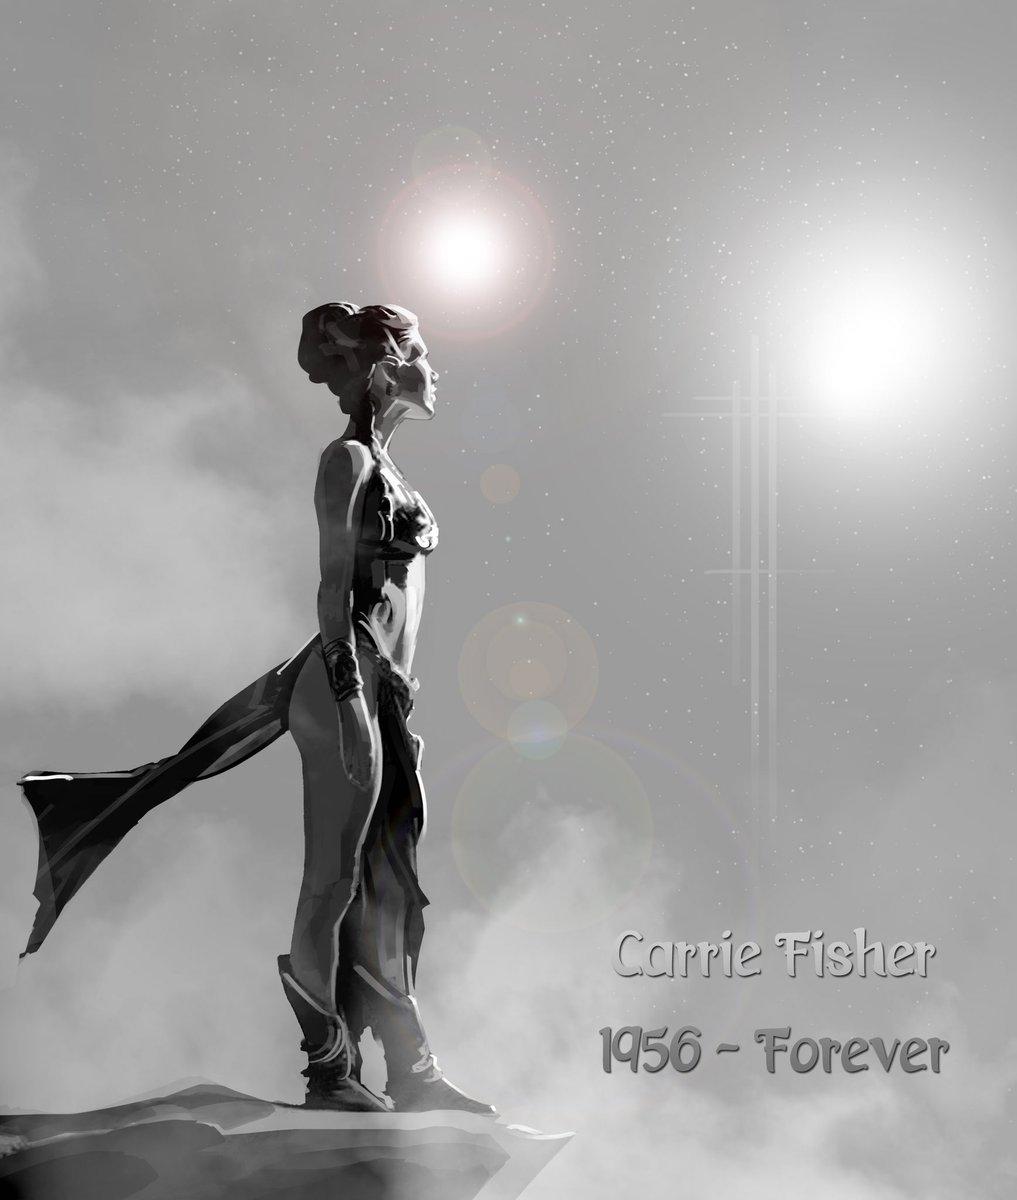 Happy Birthday you beautiful soul!! #CarrieFisher @starwars @realgaryfisher #princessleia #jedi @billielo<br>http://pic.twitter.com/P1EKE8zsul